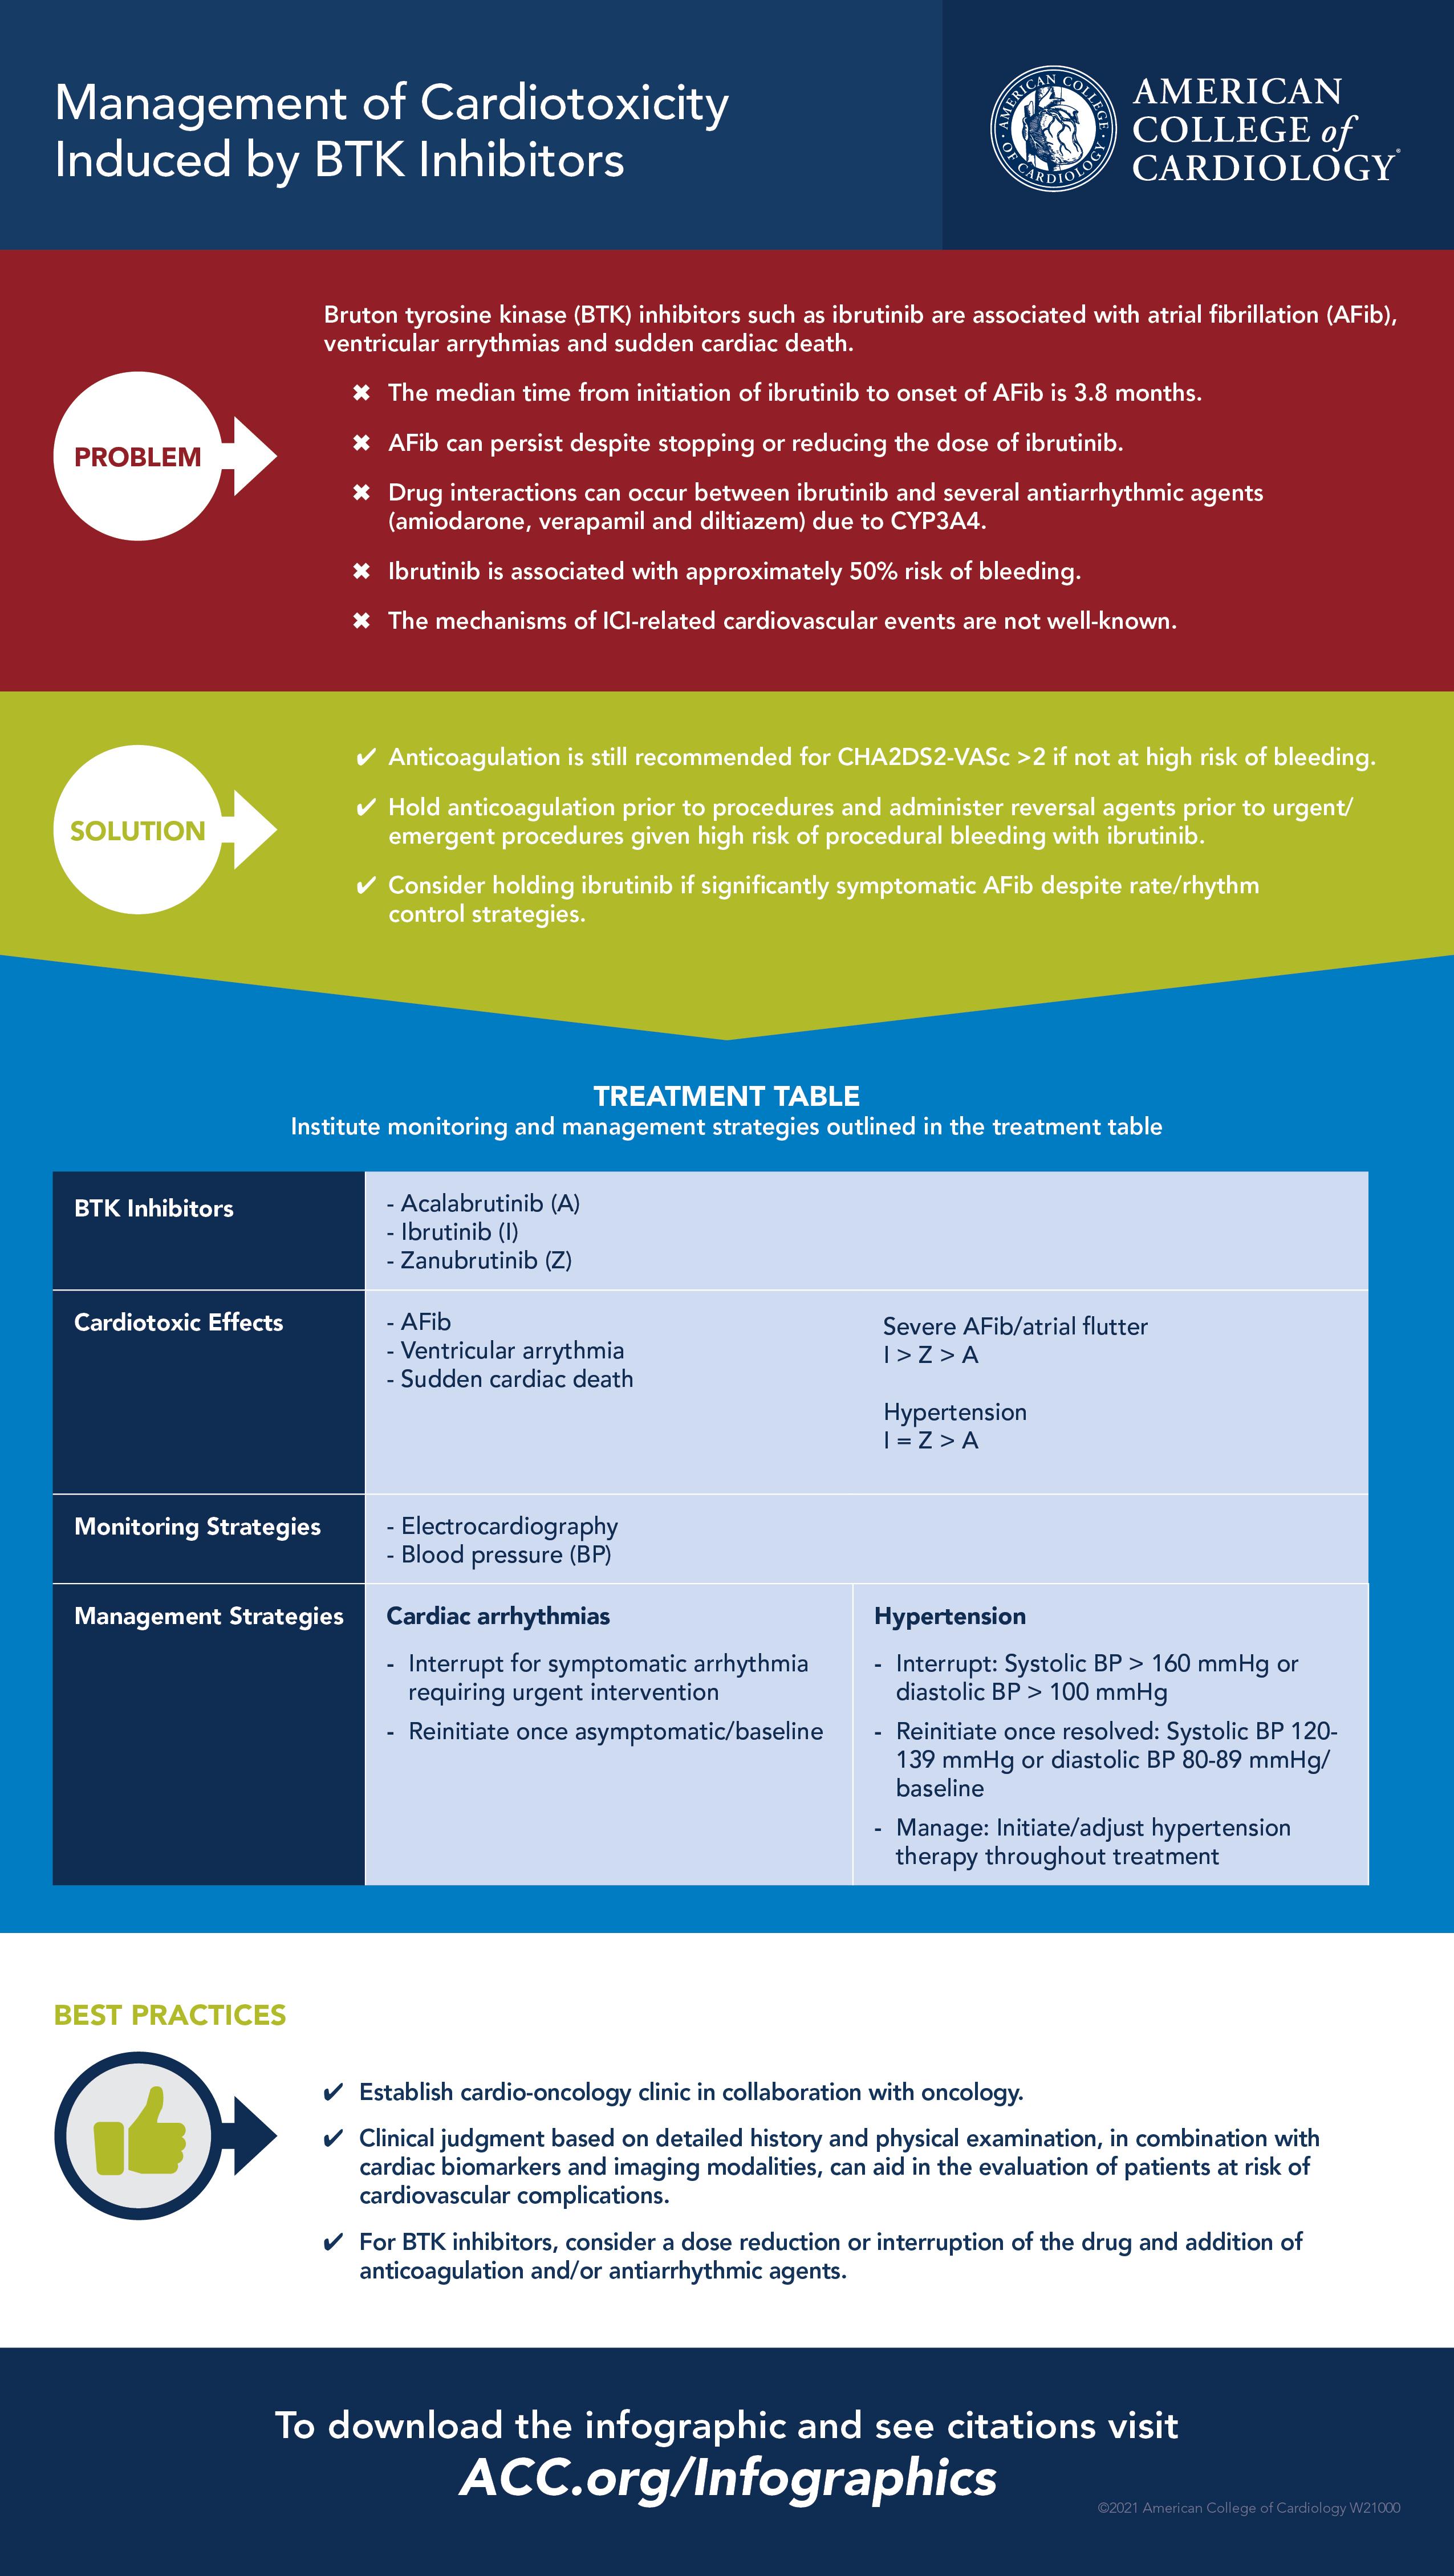 Management of Cardiotoxicity Induced by BTK Inhibitors